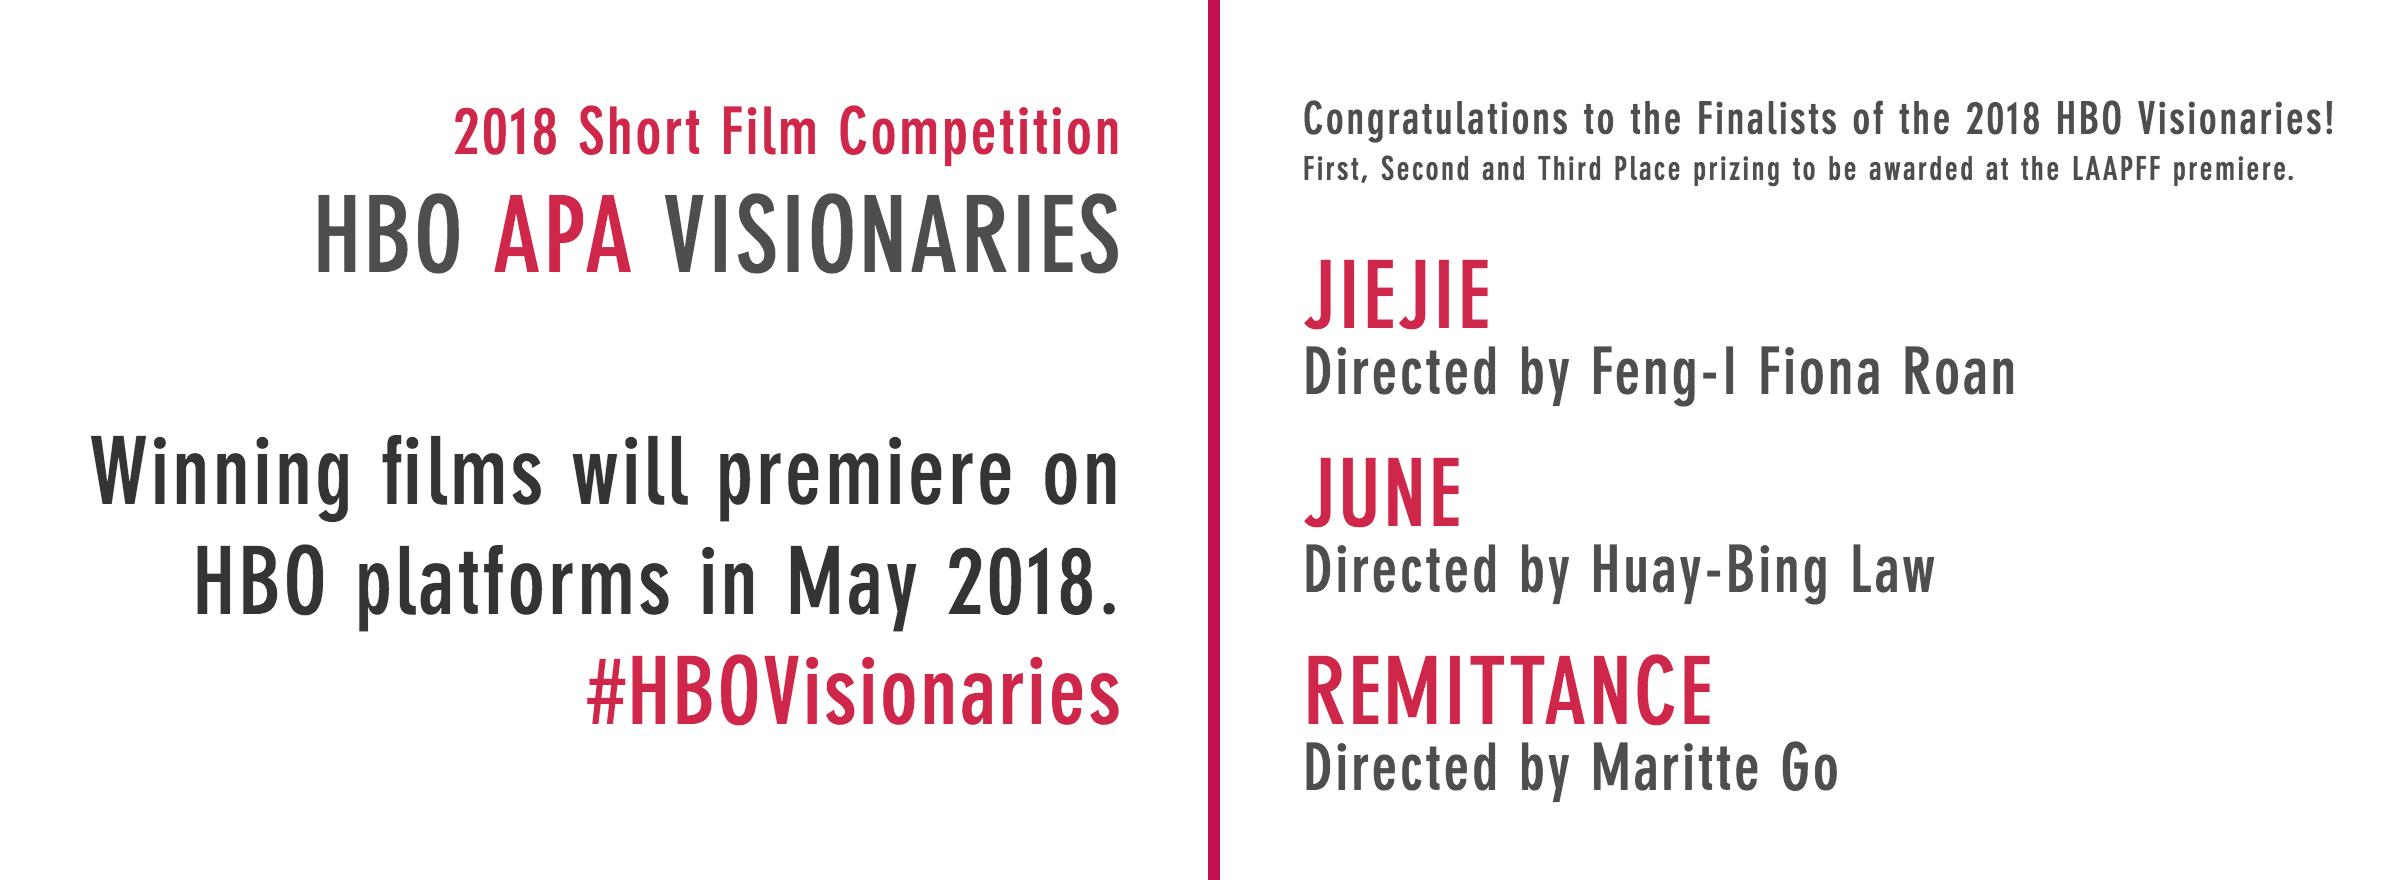 HBOVisionaries2018.png